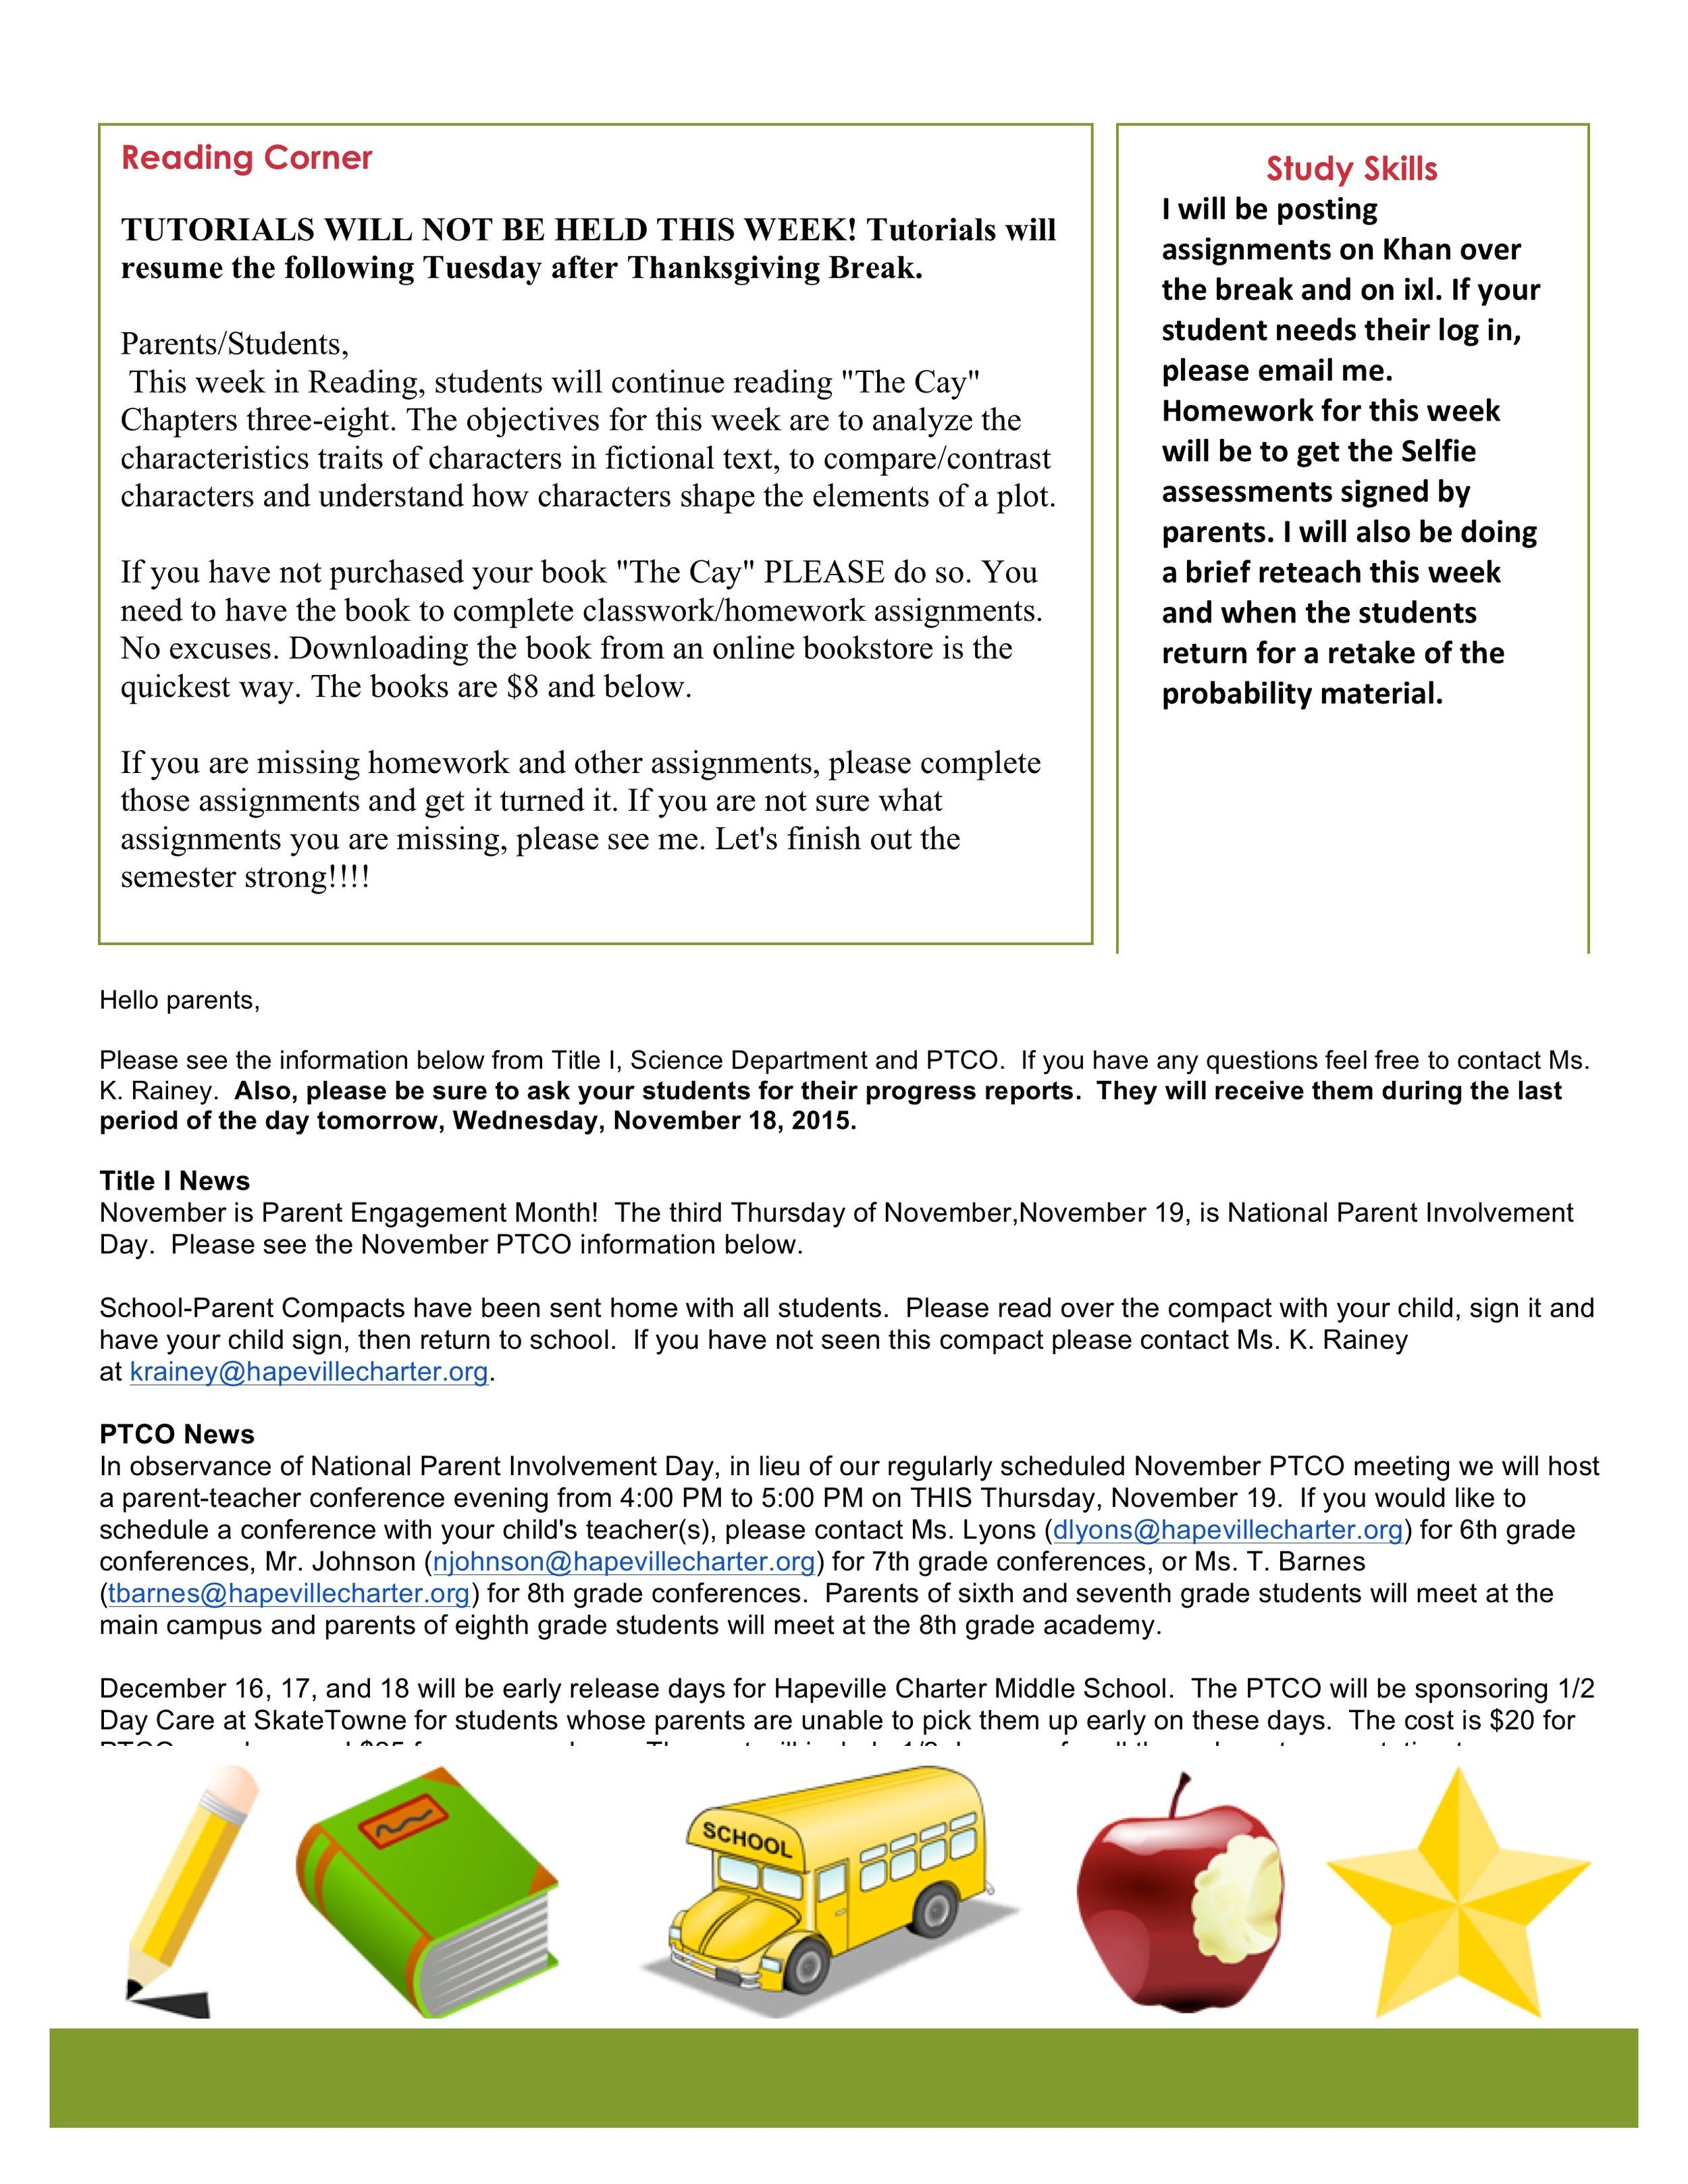 Newsletter Image7th grade nov 16 - 20 2.jpeg